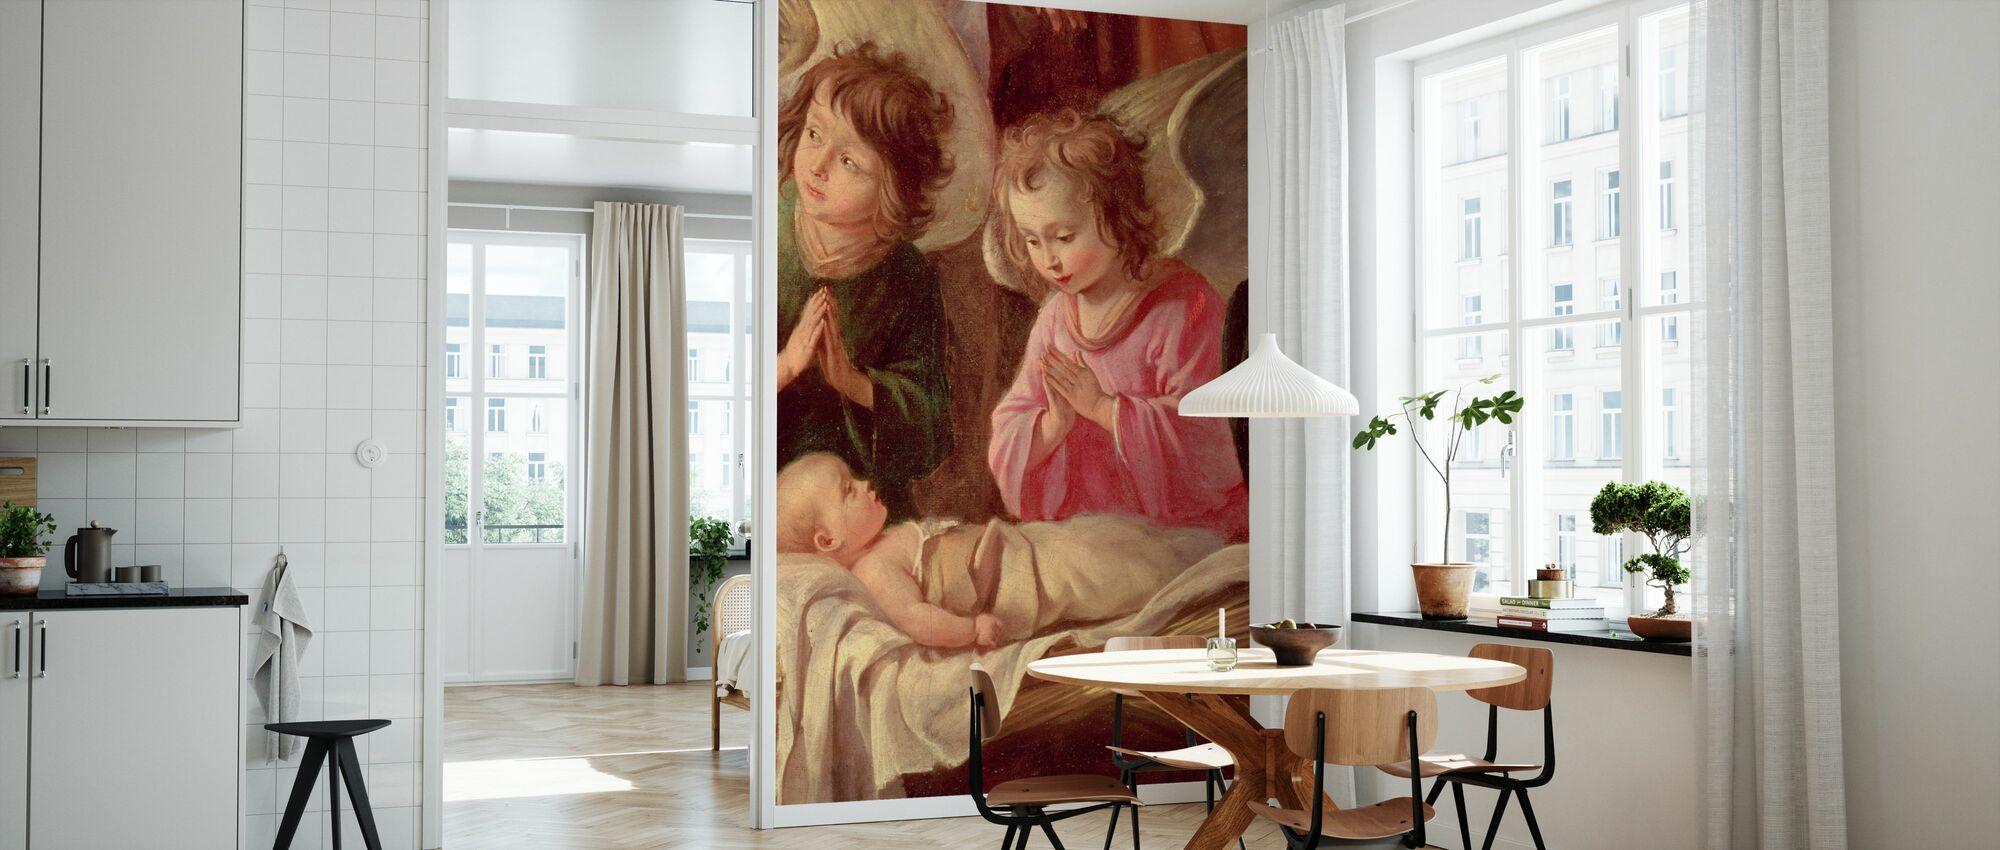 Adoration of the Shepherds - Antoine Le Nain - Wallpaper - Kitchen